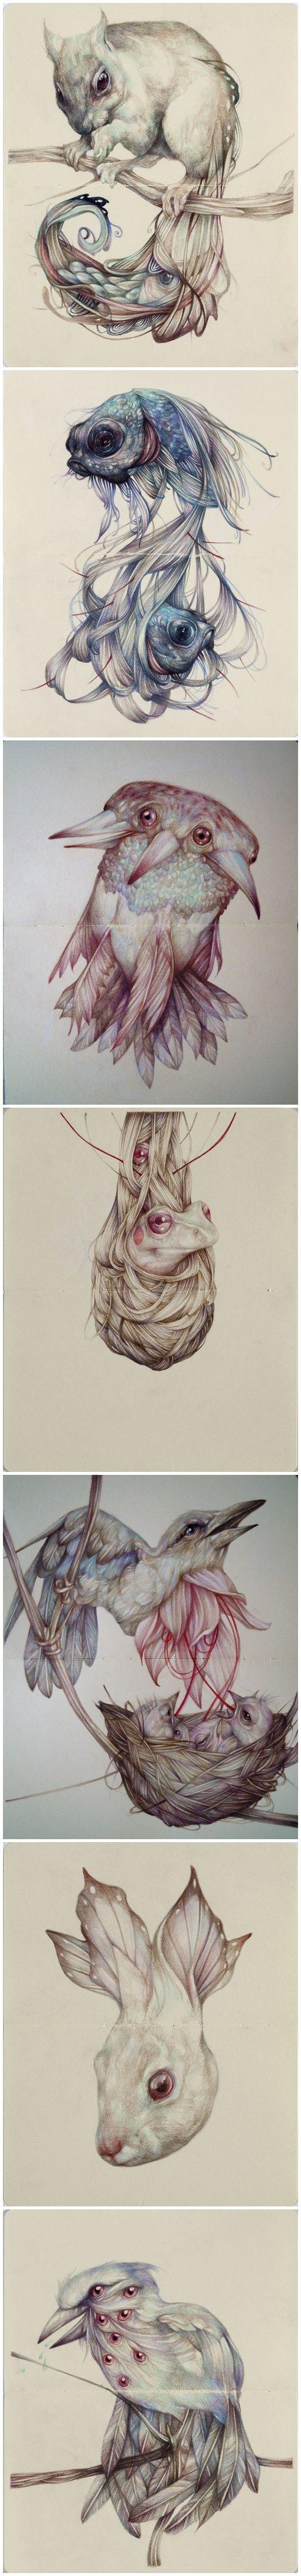 Surrealistic Animal Creatures by Marco Mezzoni on Tumblr.